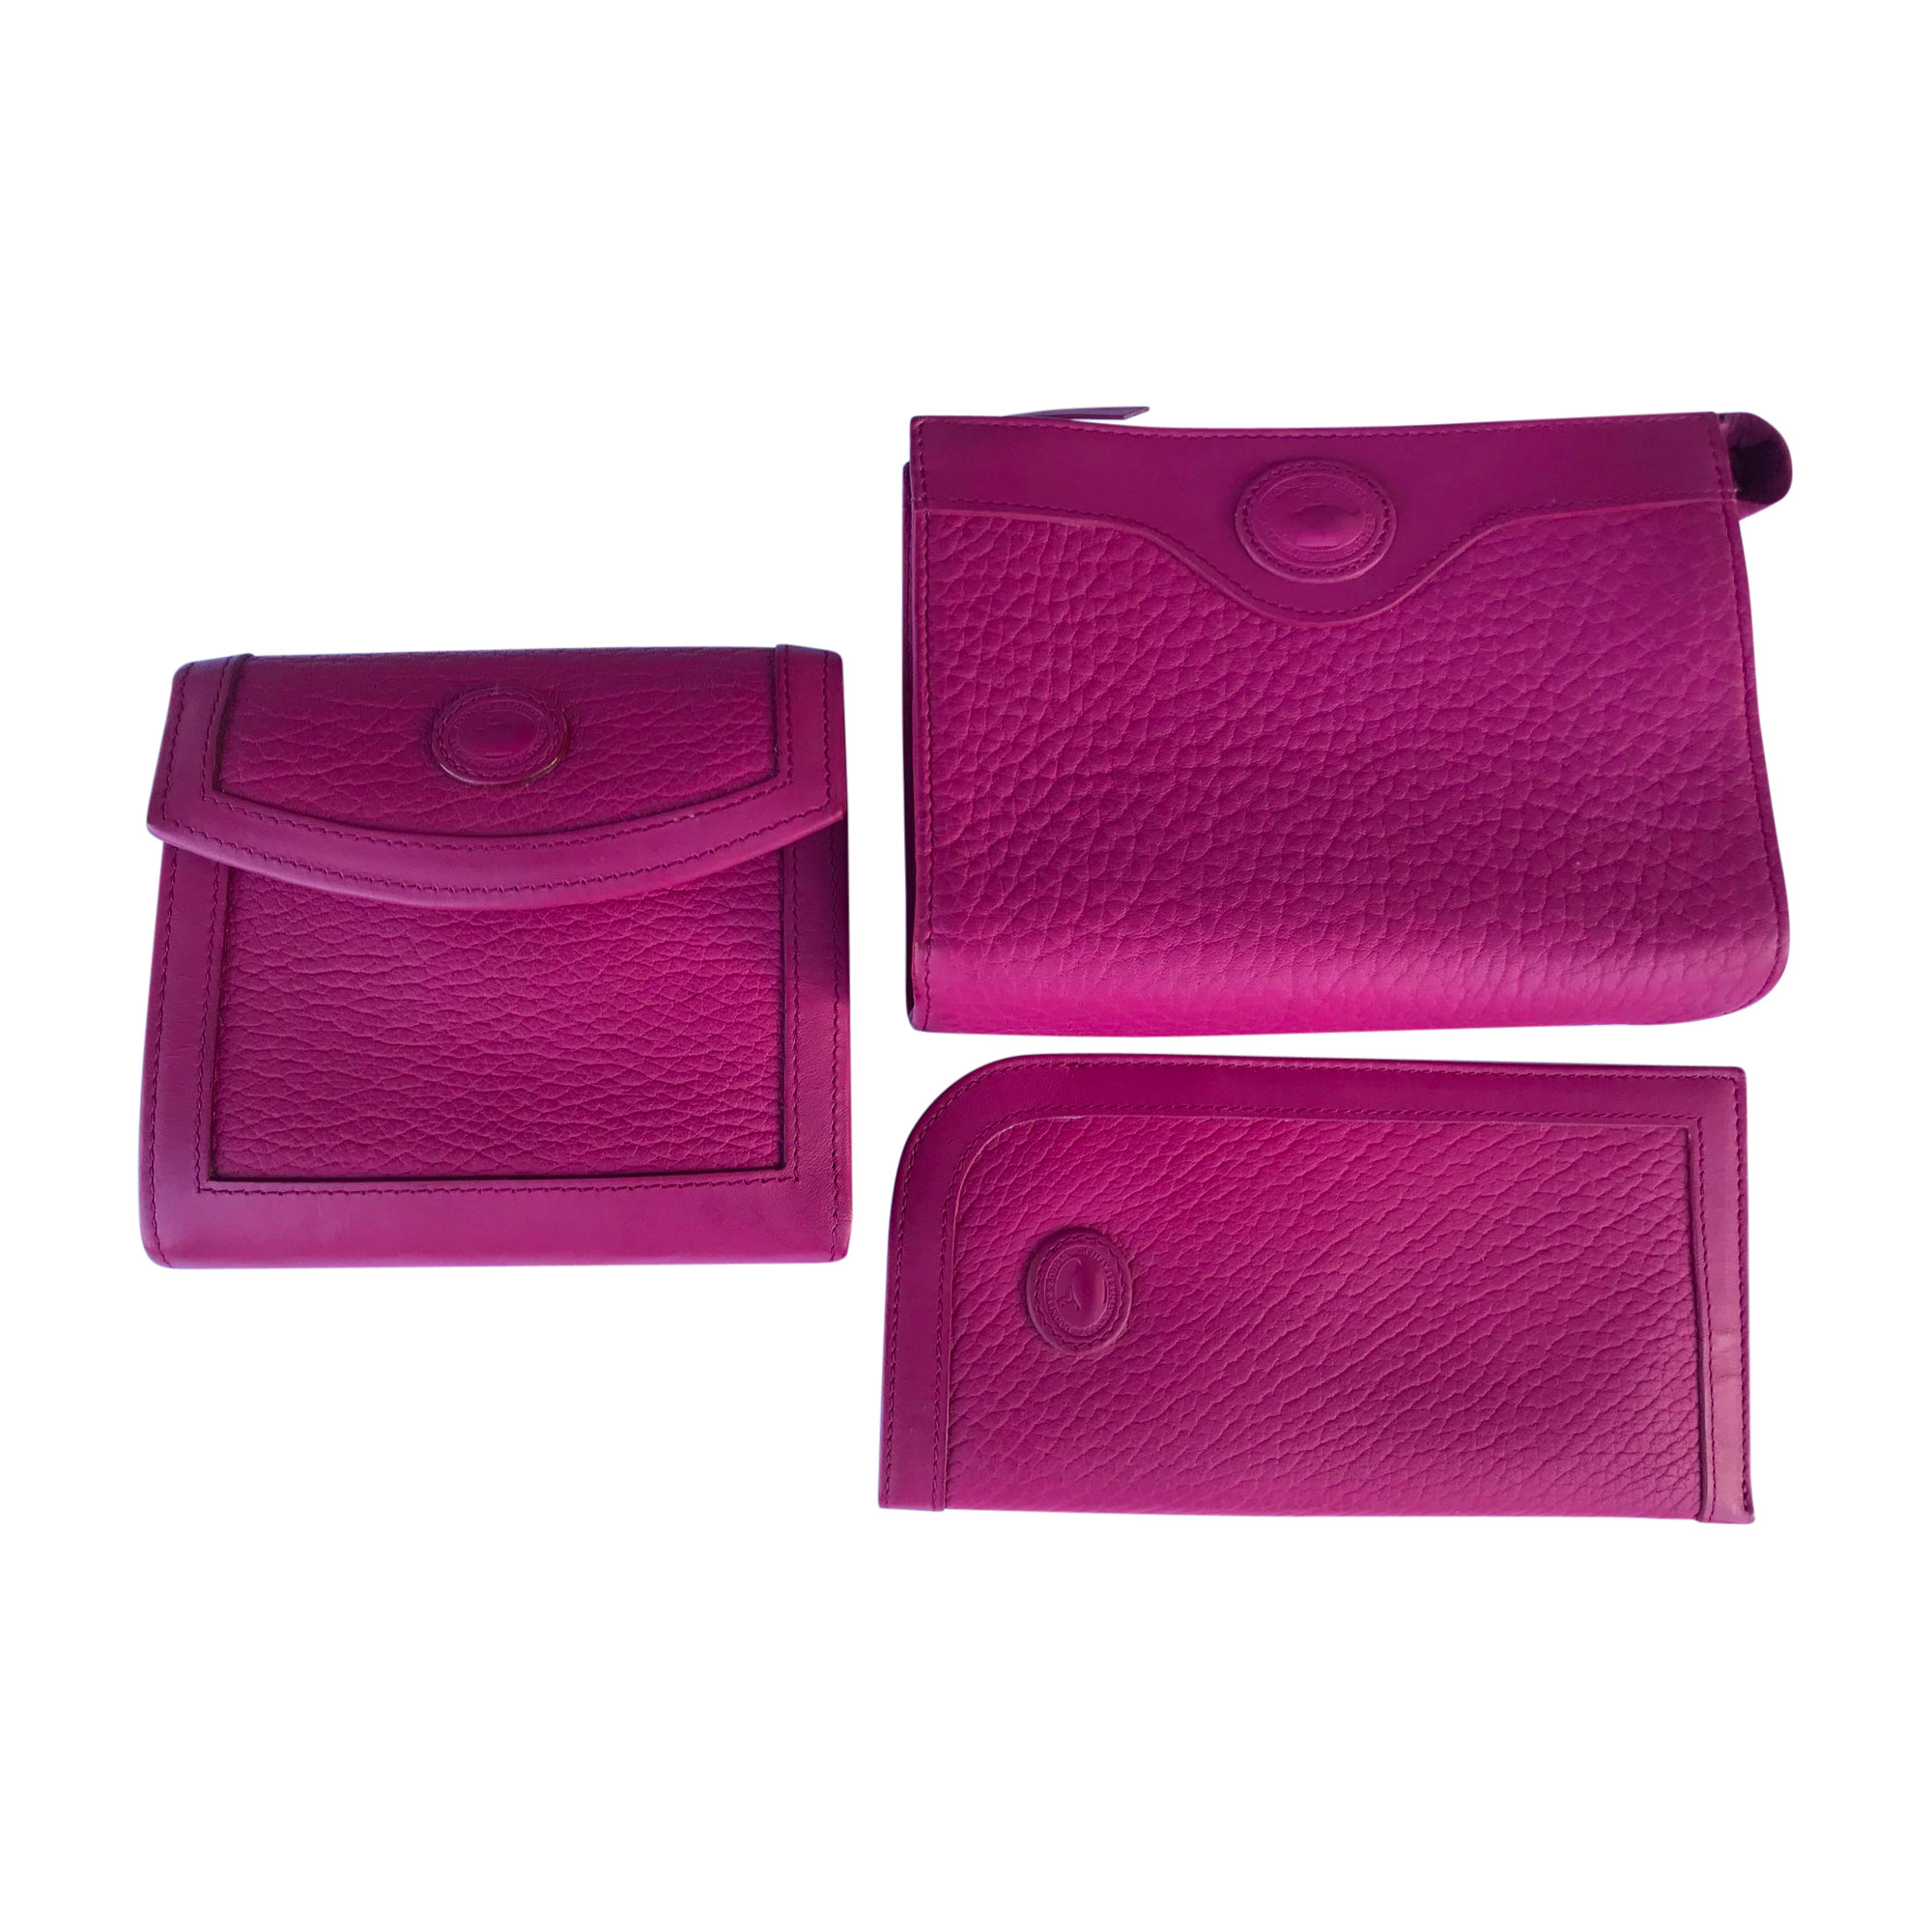 Porte-monnaie DOONEY & BOURKE cuir rose